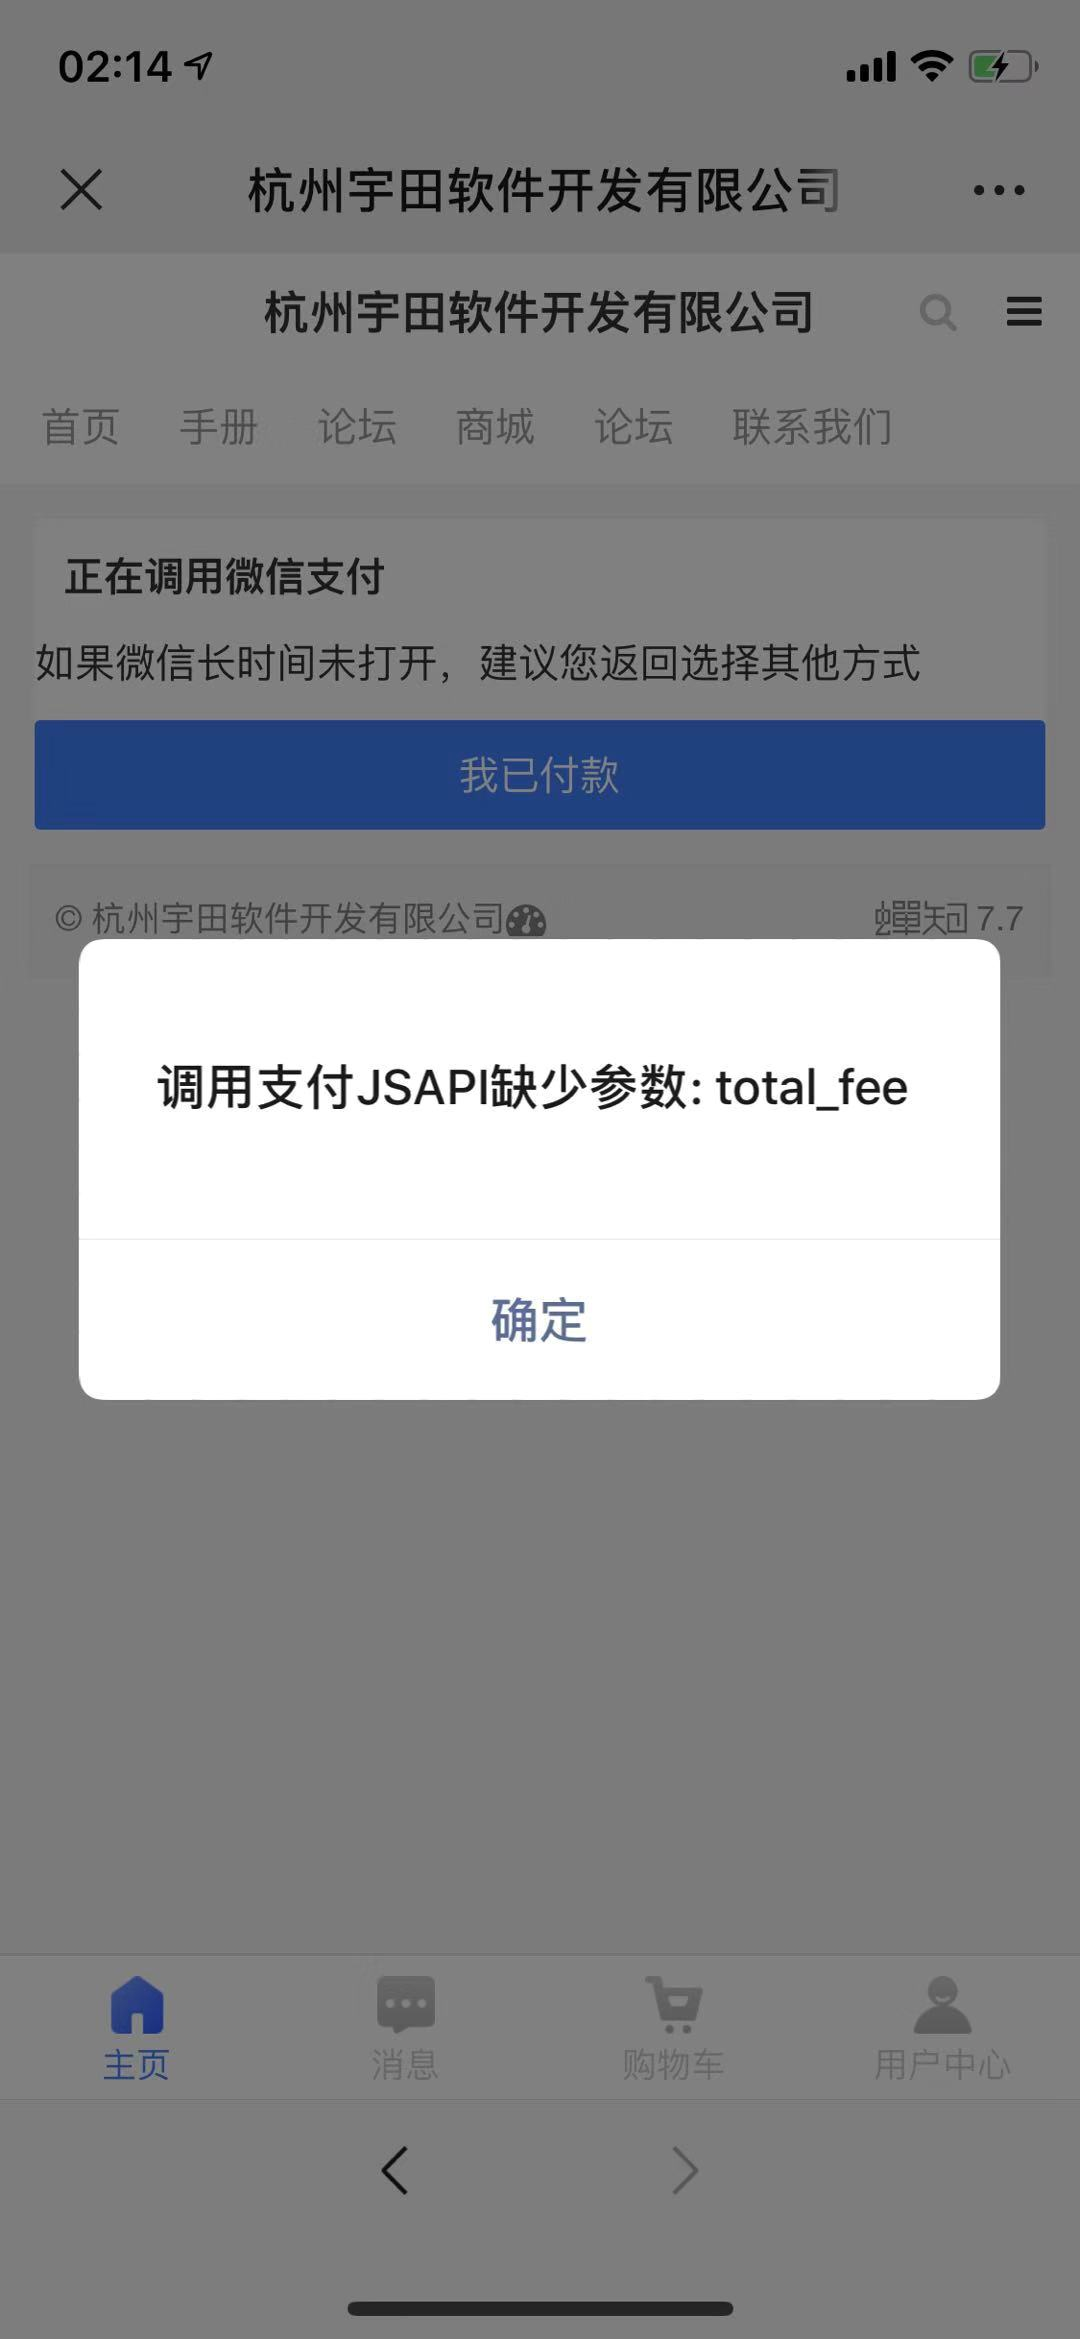 qq黑客群号_微信支付调用支付jsapi缺少参数:total_fee - 技术支持 - 全网营销 ...